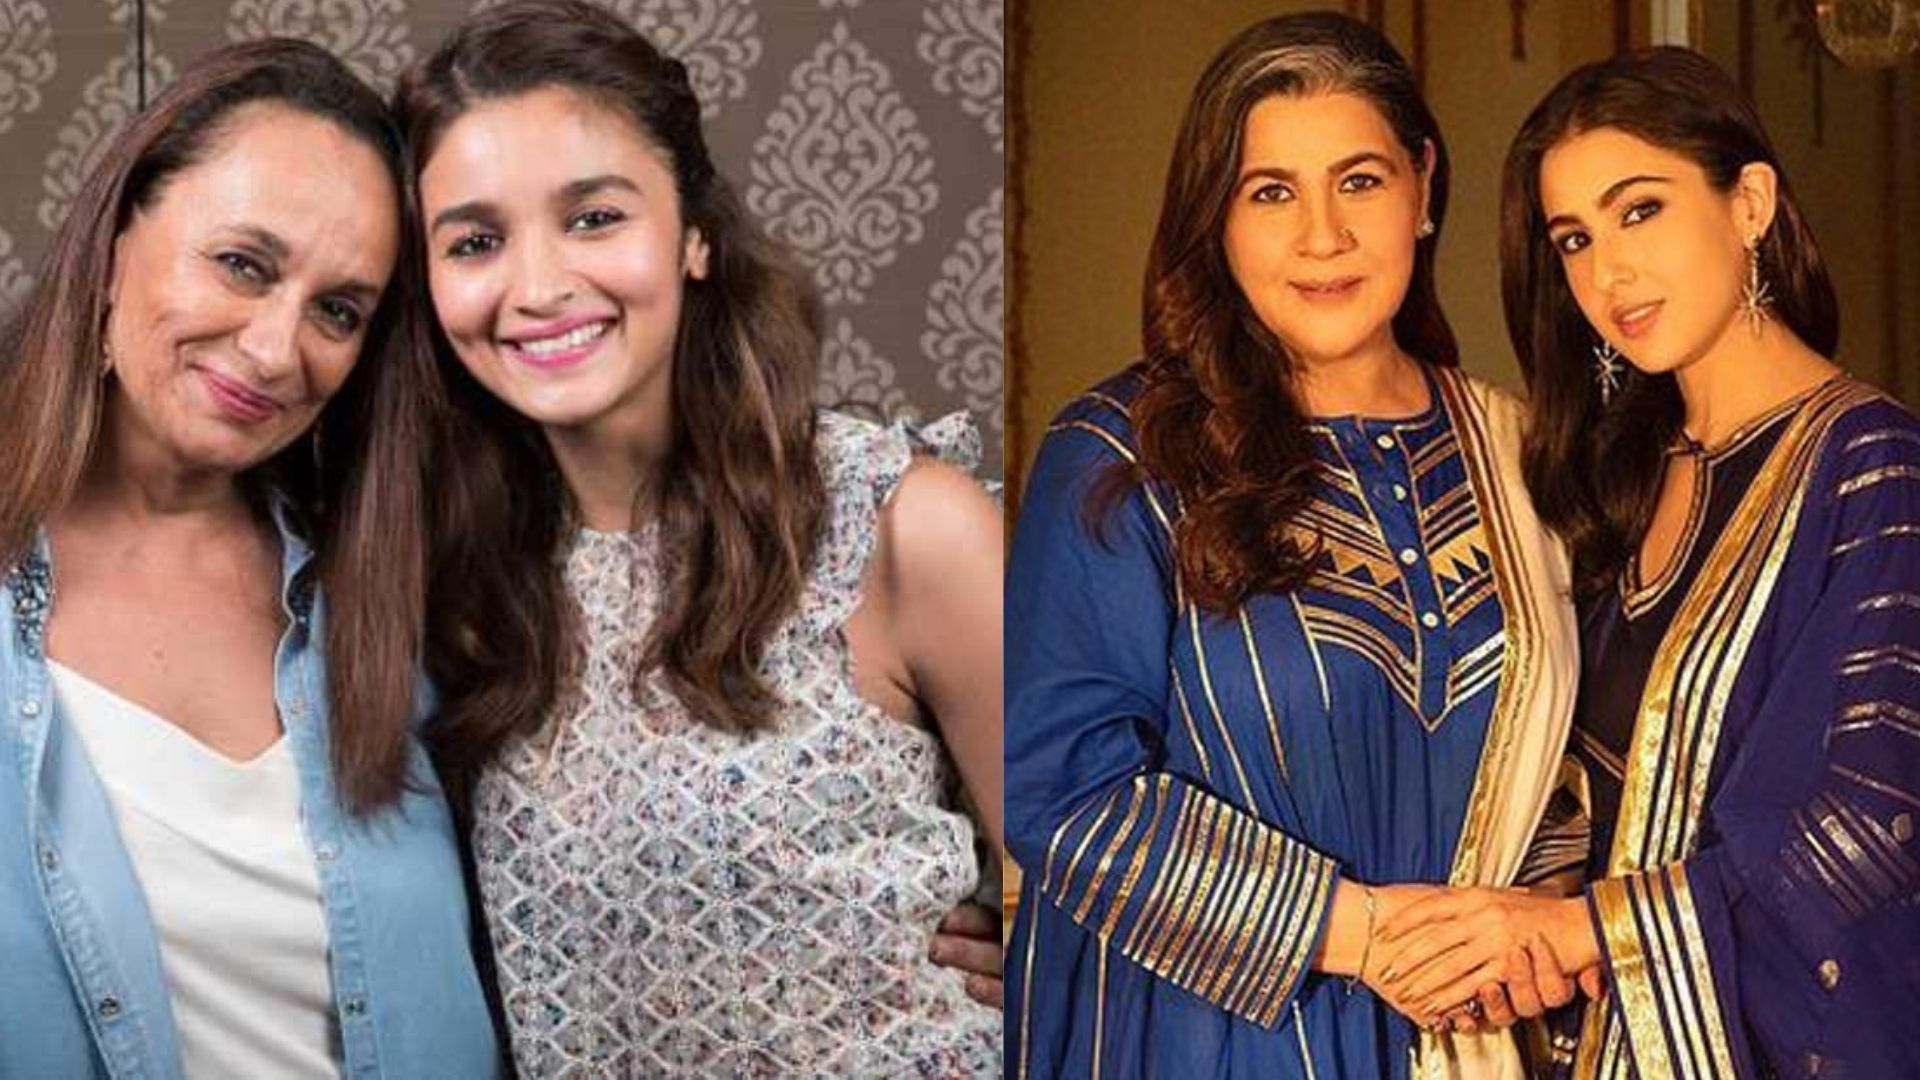 Daughter's Day: Alia Bhatt-Soni Razdan, Sara Ali Khan-Amrita Singh- Bollywood's Most Stylish Mother-Daughter Jodis